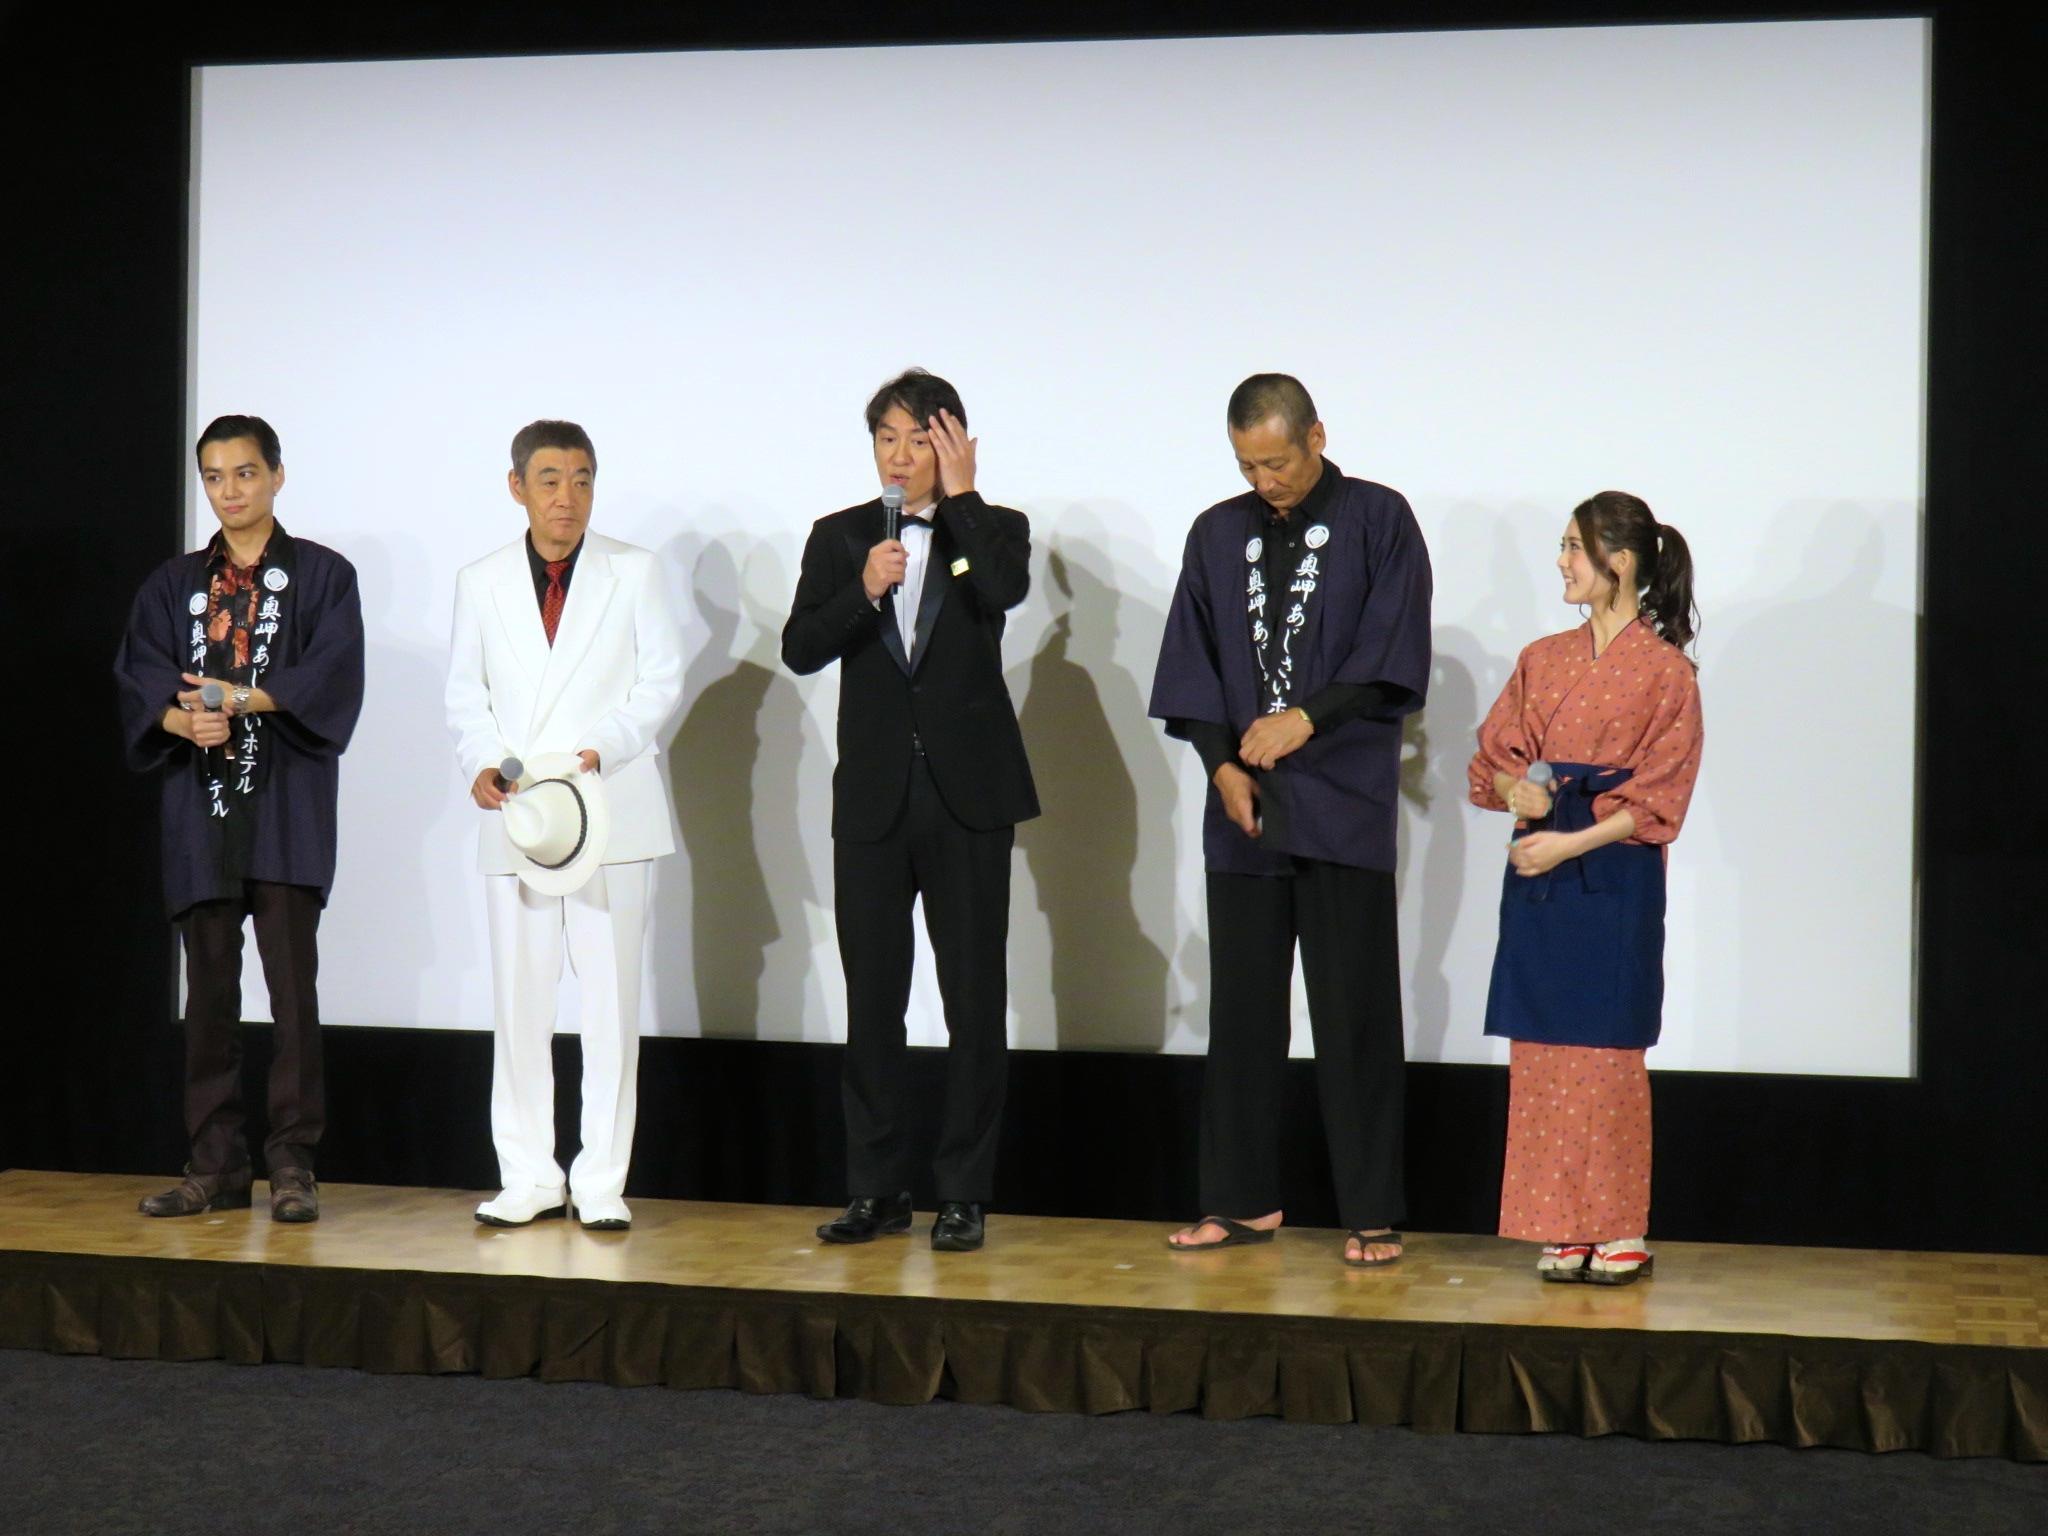 http://news.yoshimoto.co.jp/20171006210636-2d761ede20dcd5e441f1e0f7b1c019869c76622a.jpg